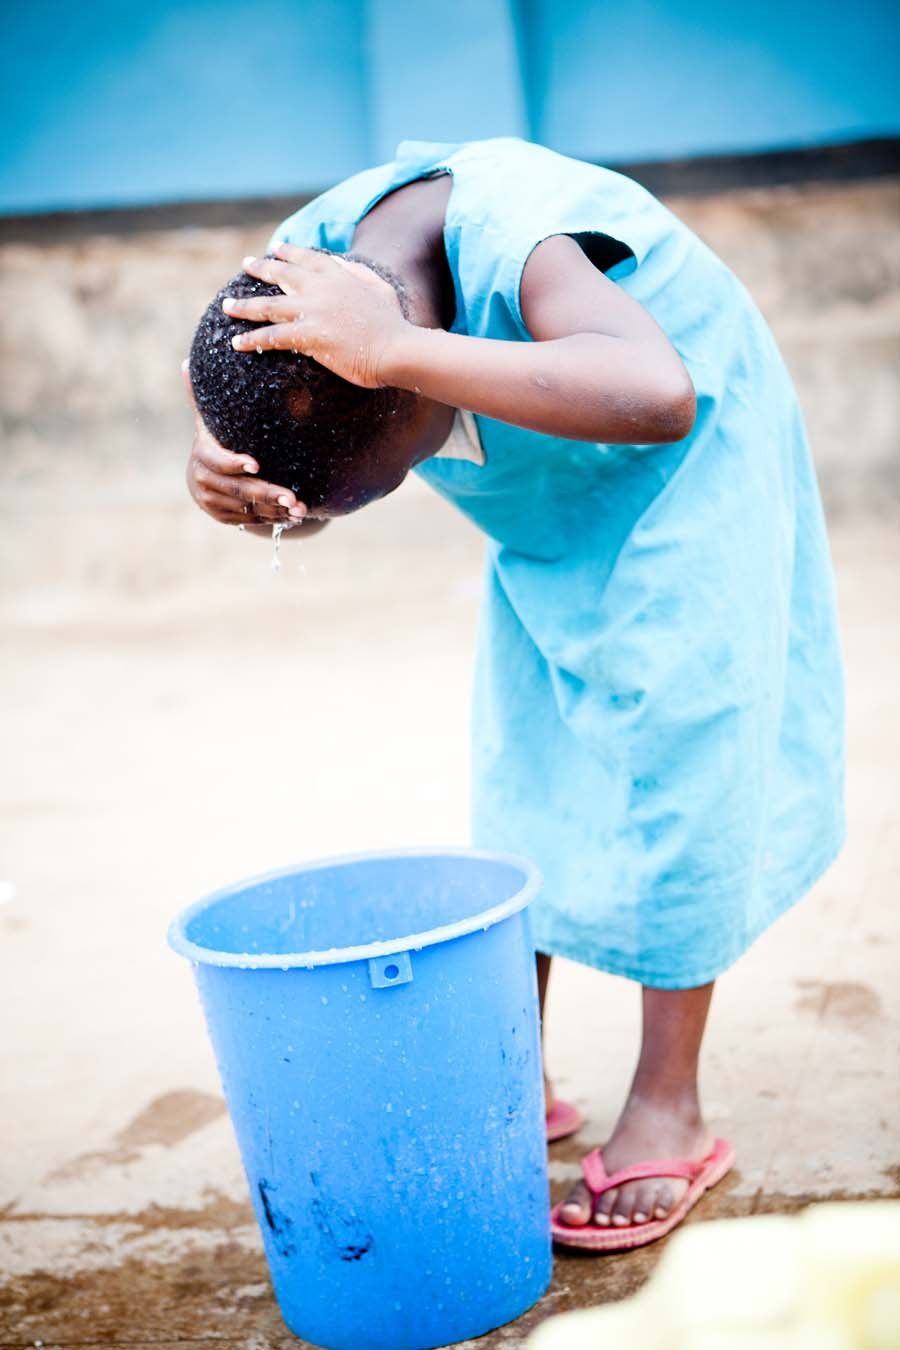 jessicadavisphotography.com | Jessica Davis Photography | Portrait Work in Uganda| Travel Photographer | World Event Photographs 6 (2).jpg